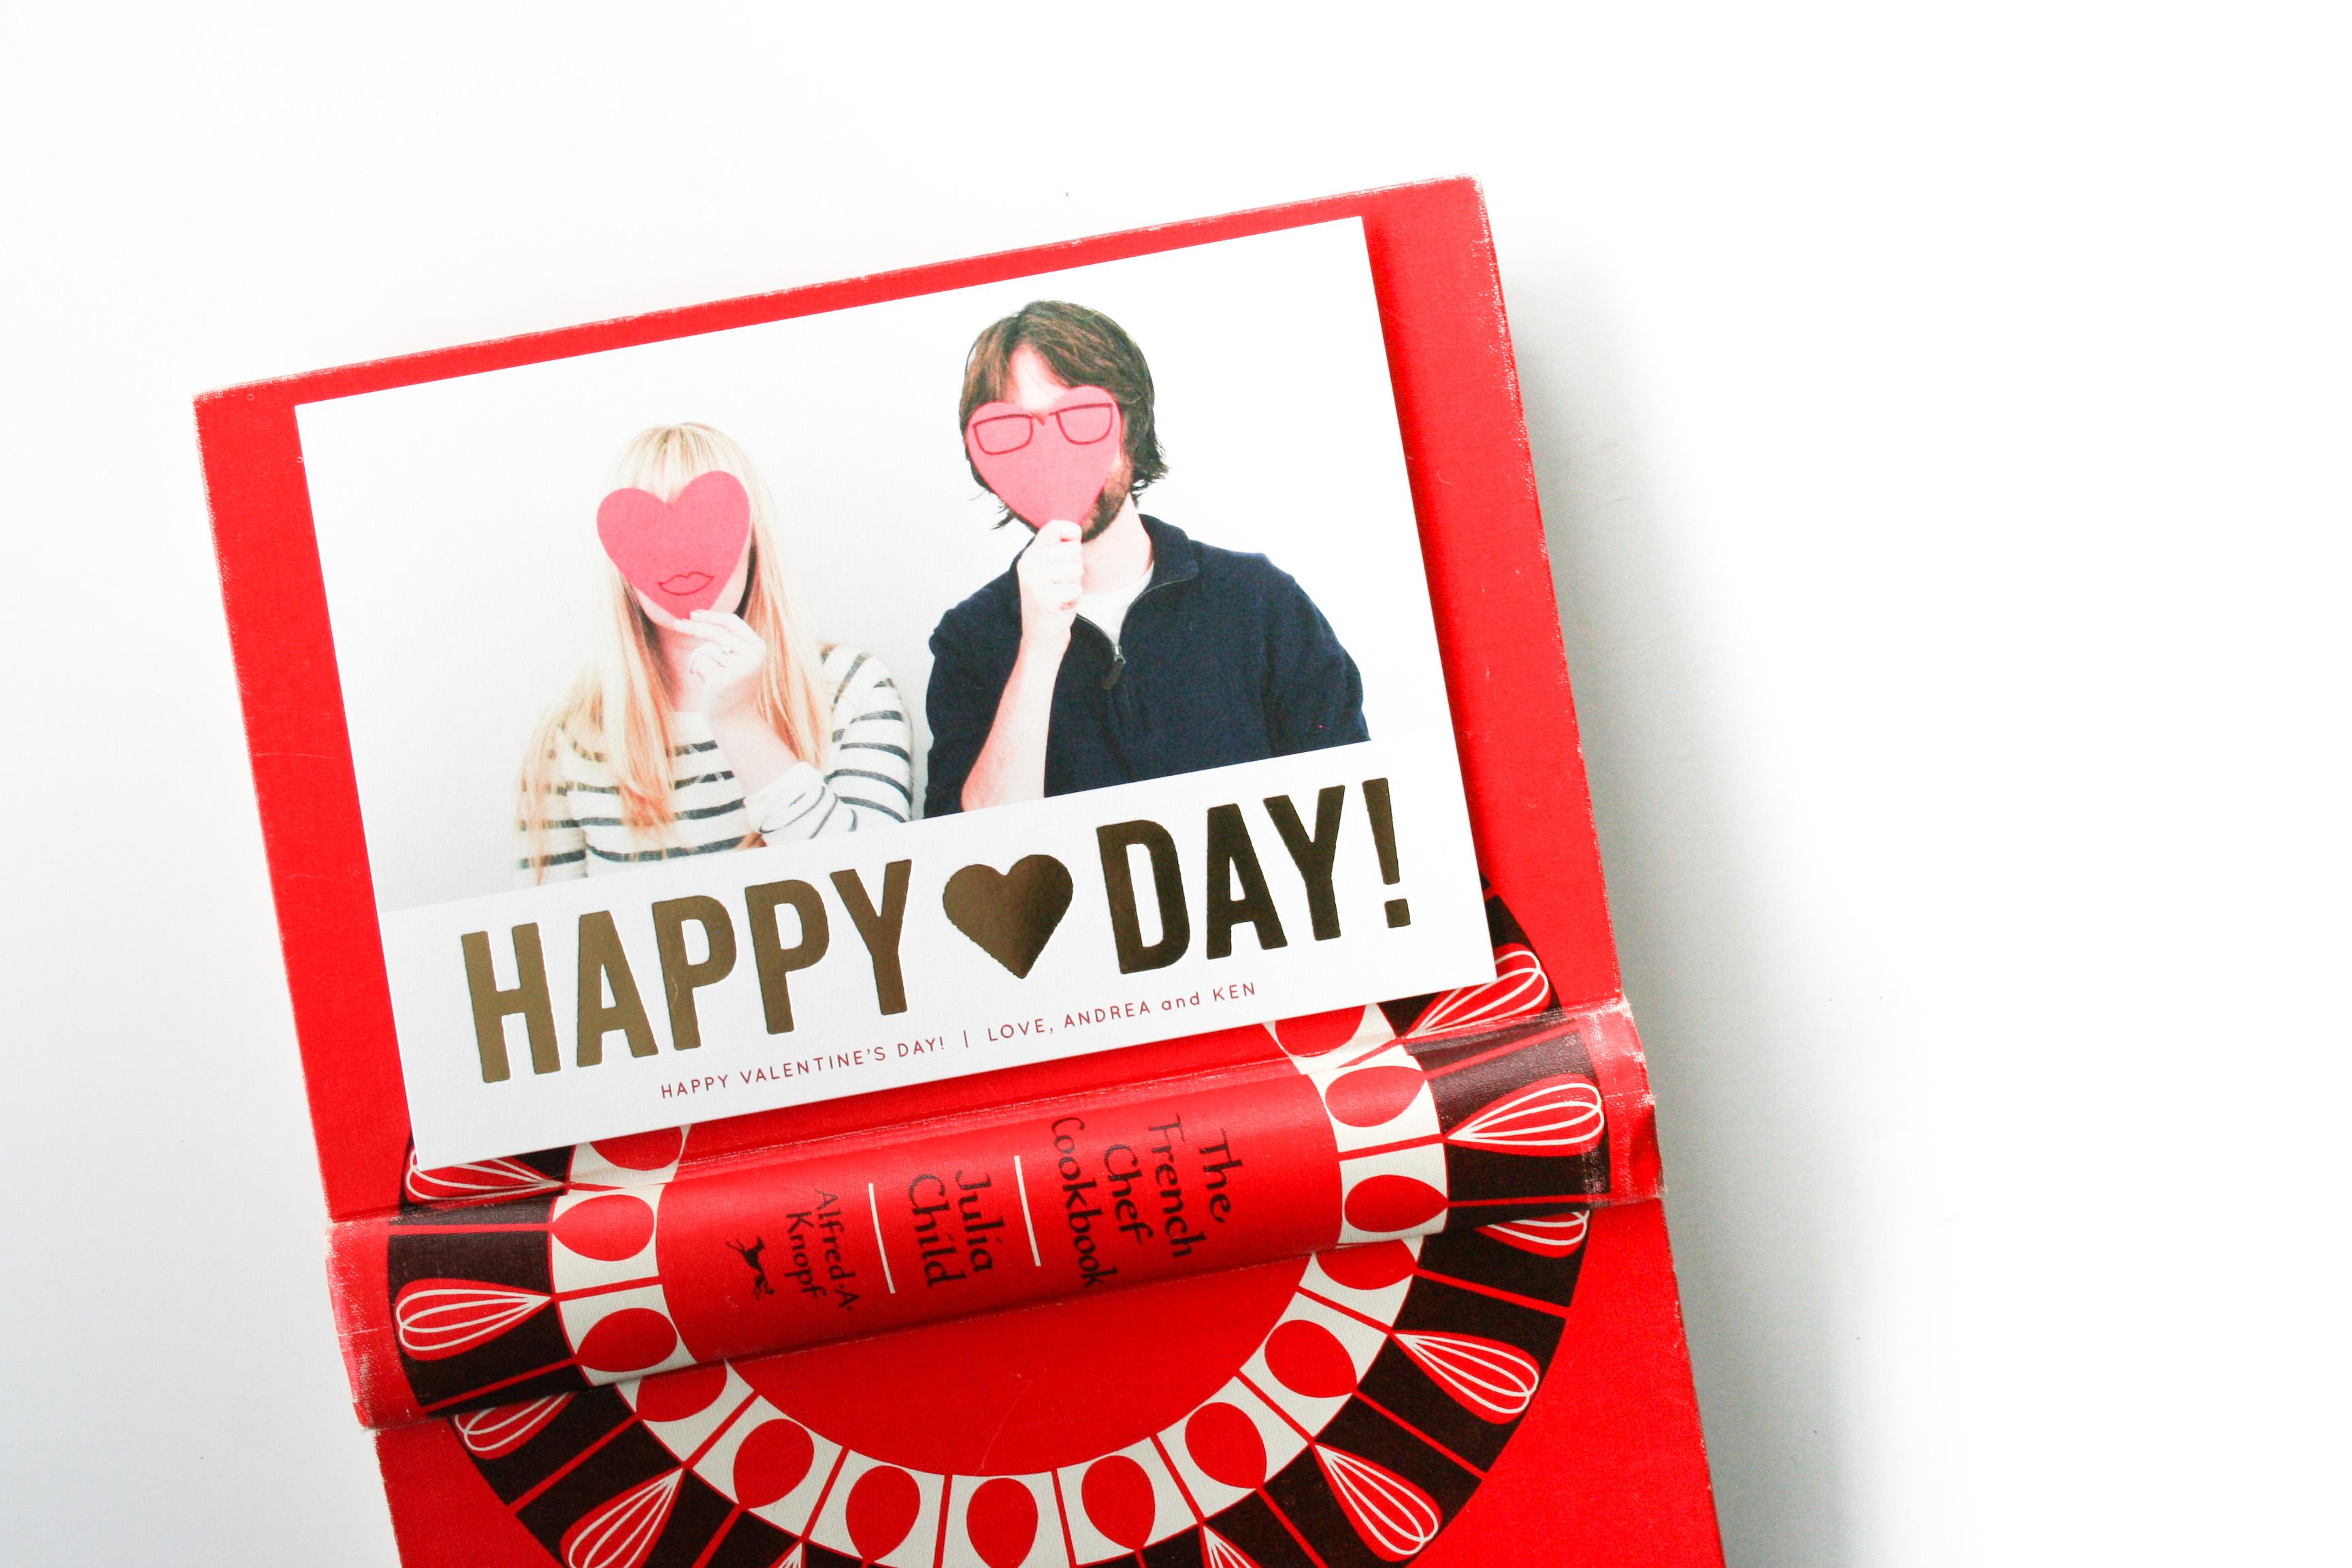 Julia Child Valentines Day Cards - Legal Miss Sunshine